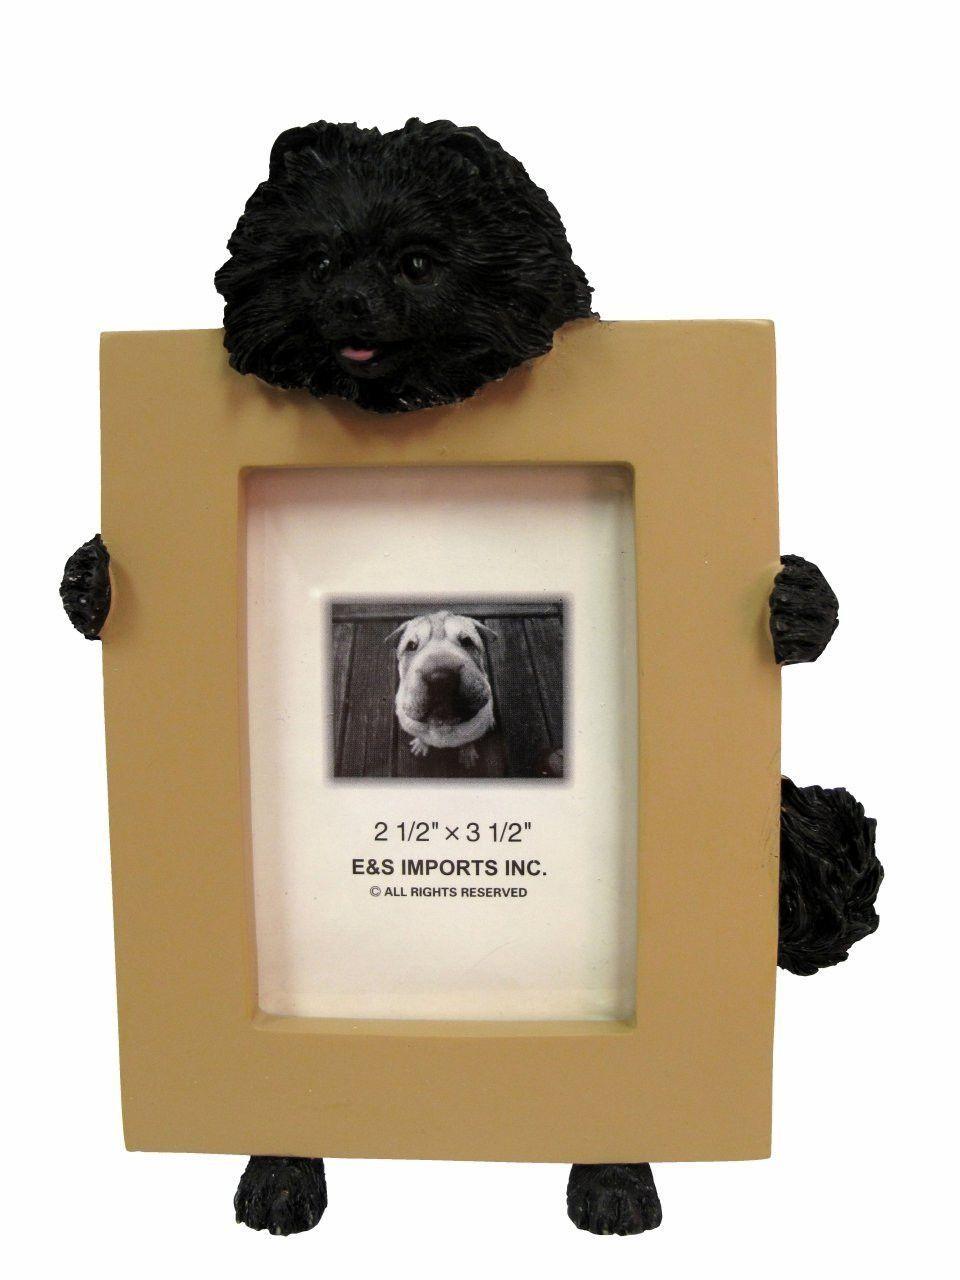 Pomeranian Black Dog Picture Frame Holder | Pomeranian | Pinterest